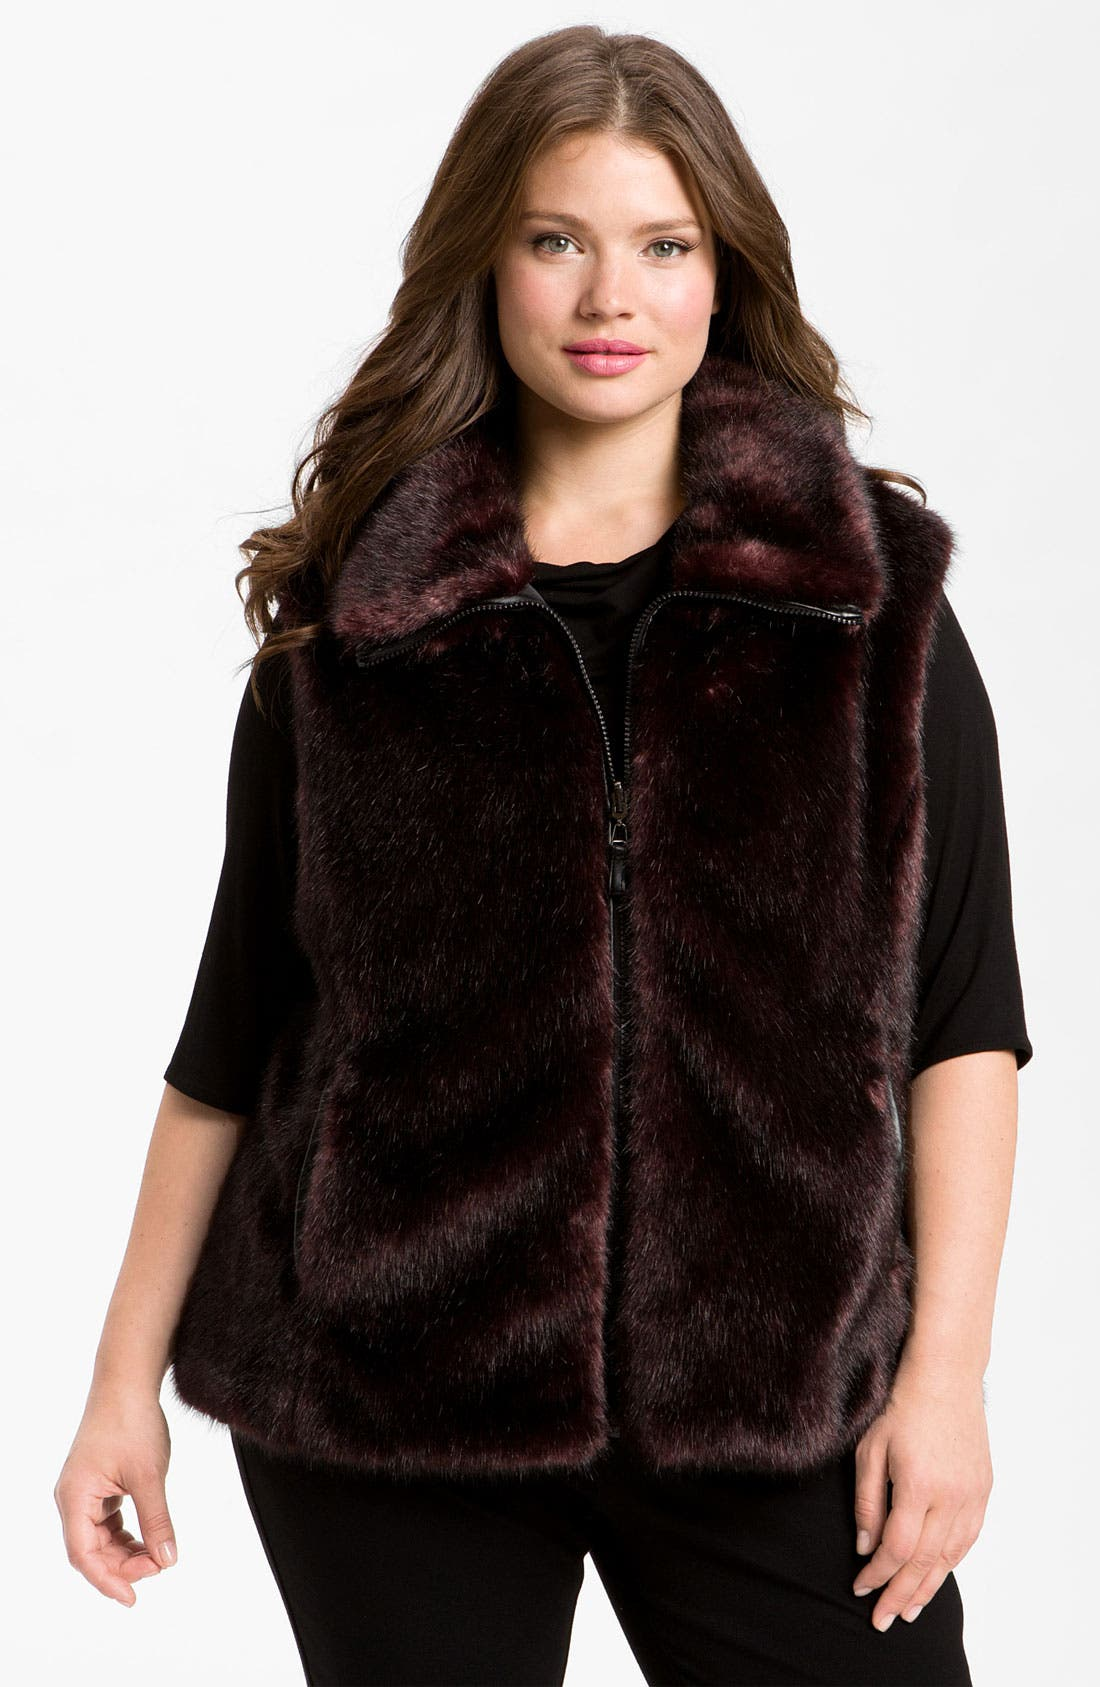 Alternate Image 1 Selected - Gallery Reversible Faux Fur Vest (Plus) (Online Exclusive)